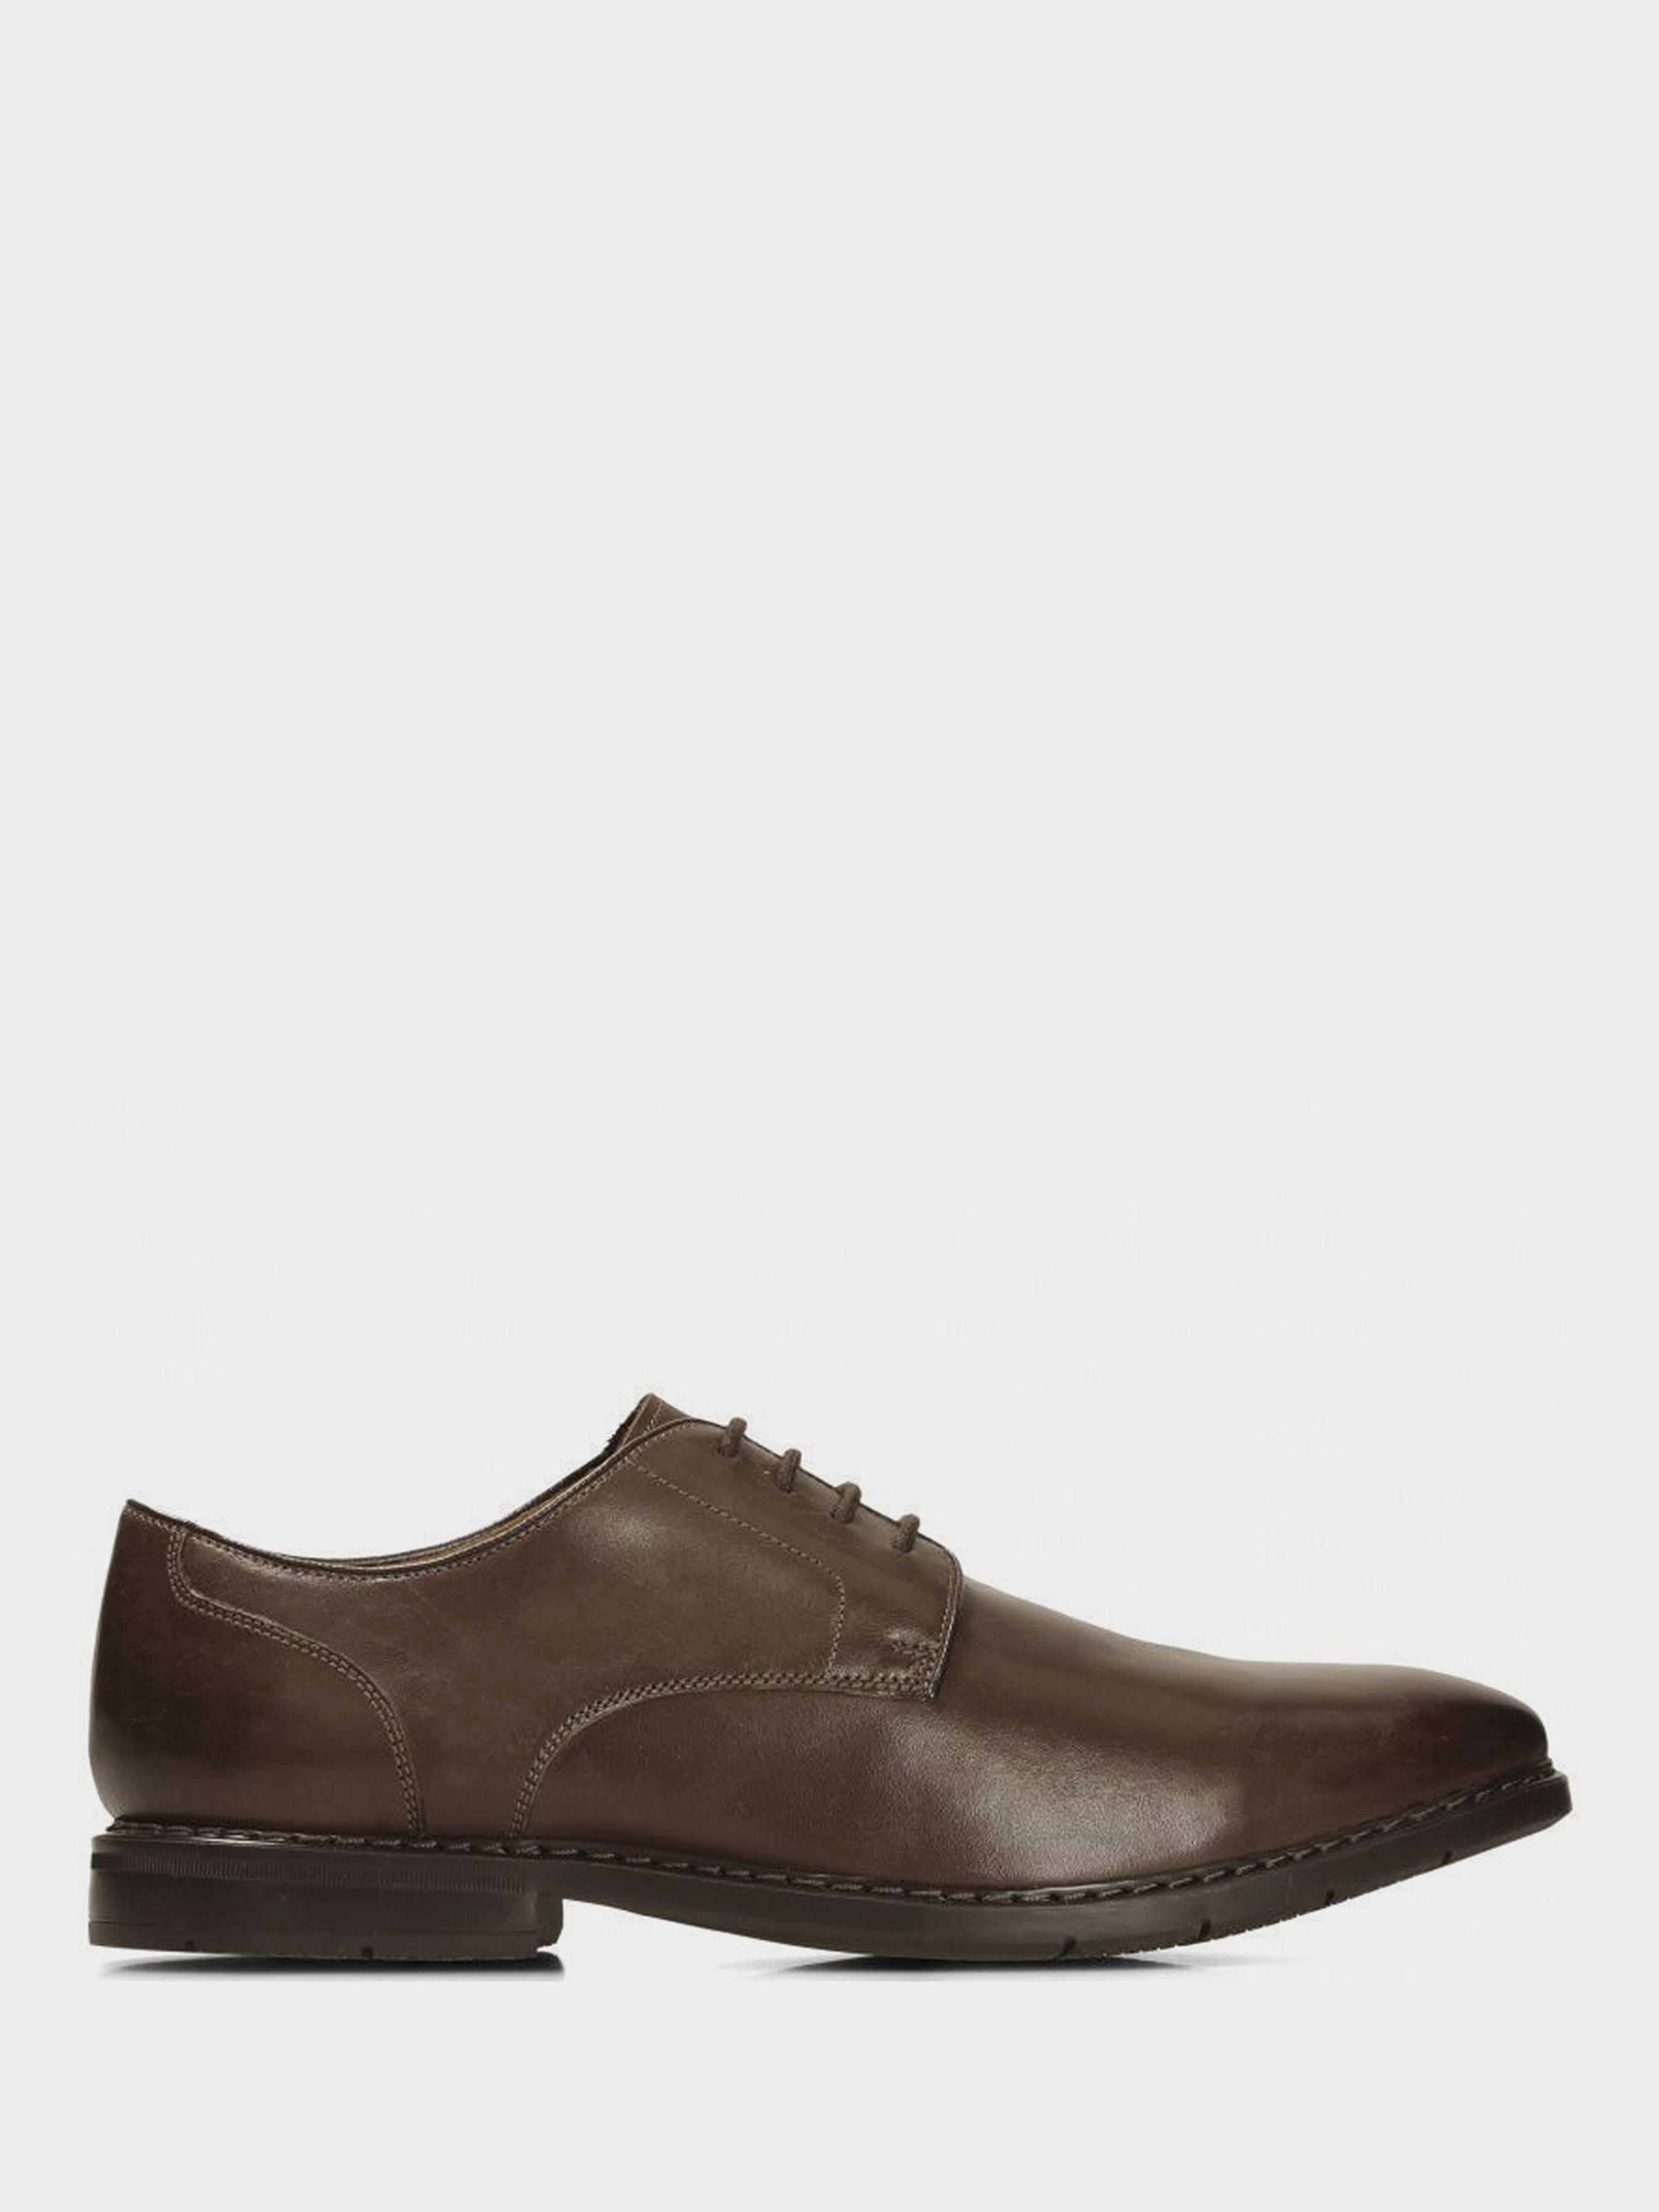 Туфли мужские Clarks Banbury Lace OM2821 цена обуви, 2017